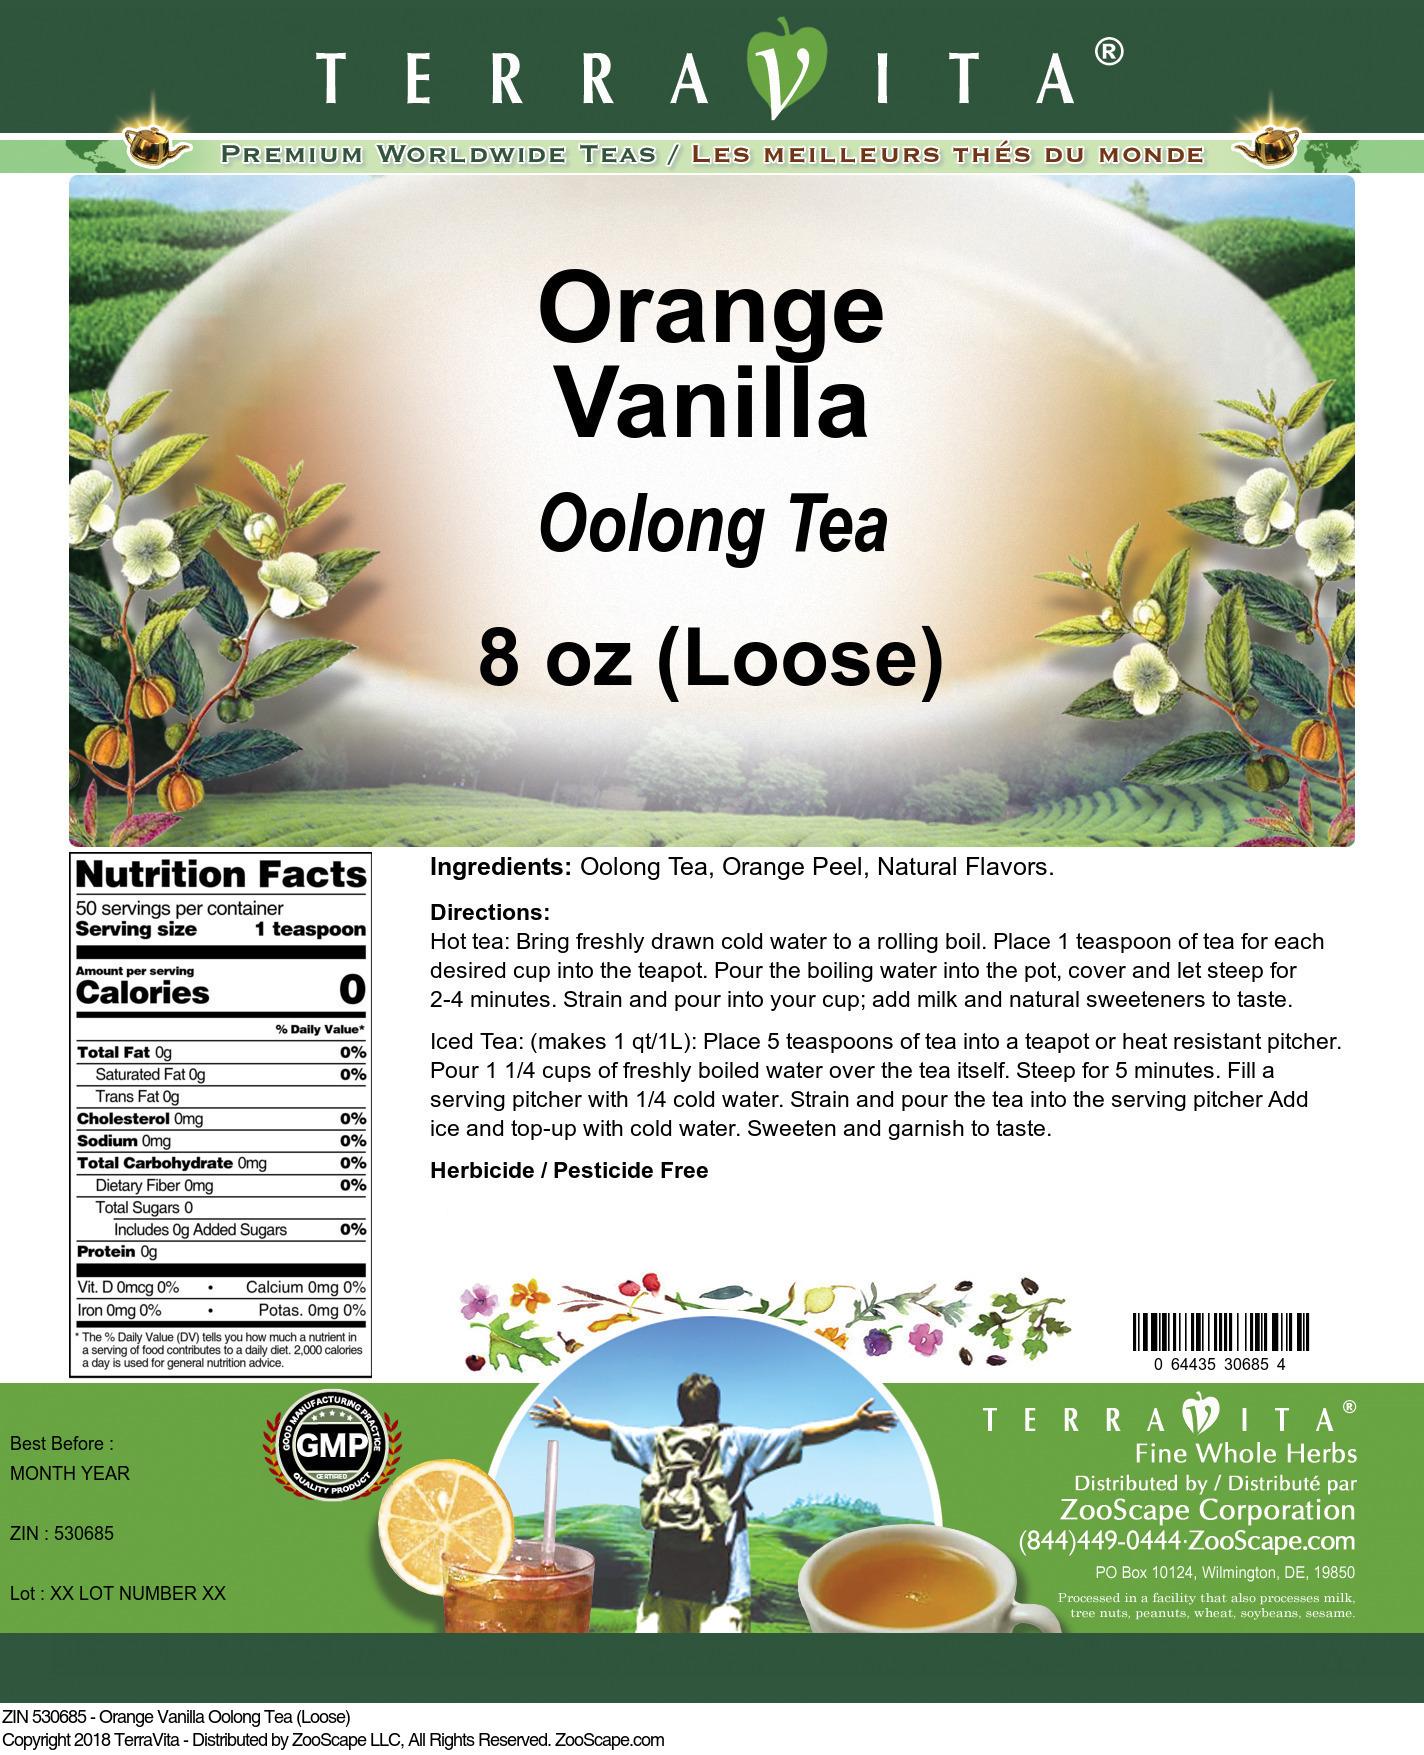 Orange Vanilla Oolong Tea